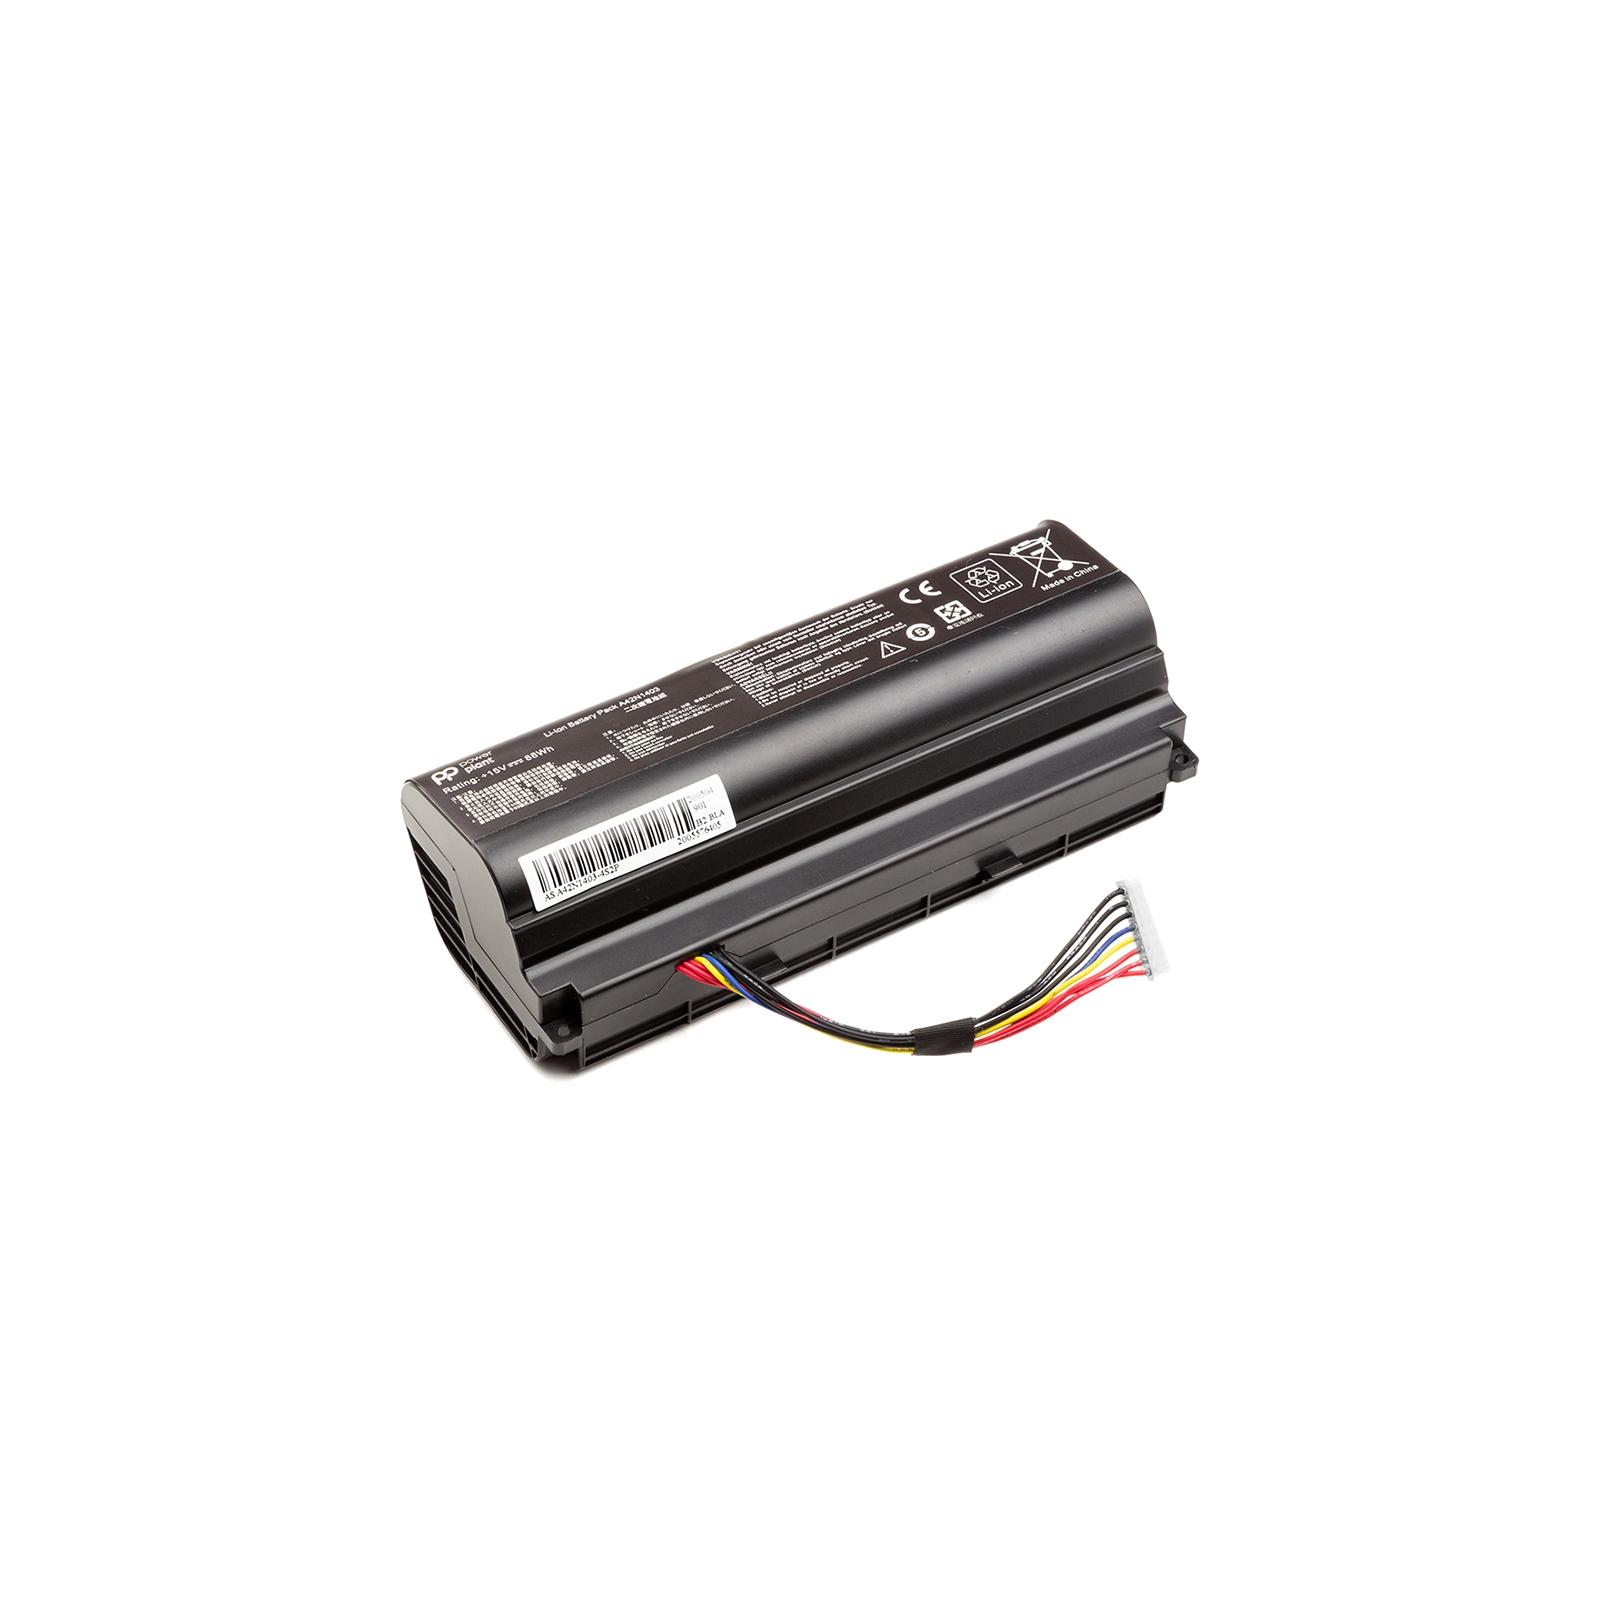 Аккумулятор для ноутбука ASUS ROG G751 (A42N1403) 15V 88Wh PowerPlant (NB430970) изображение 2